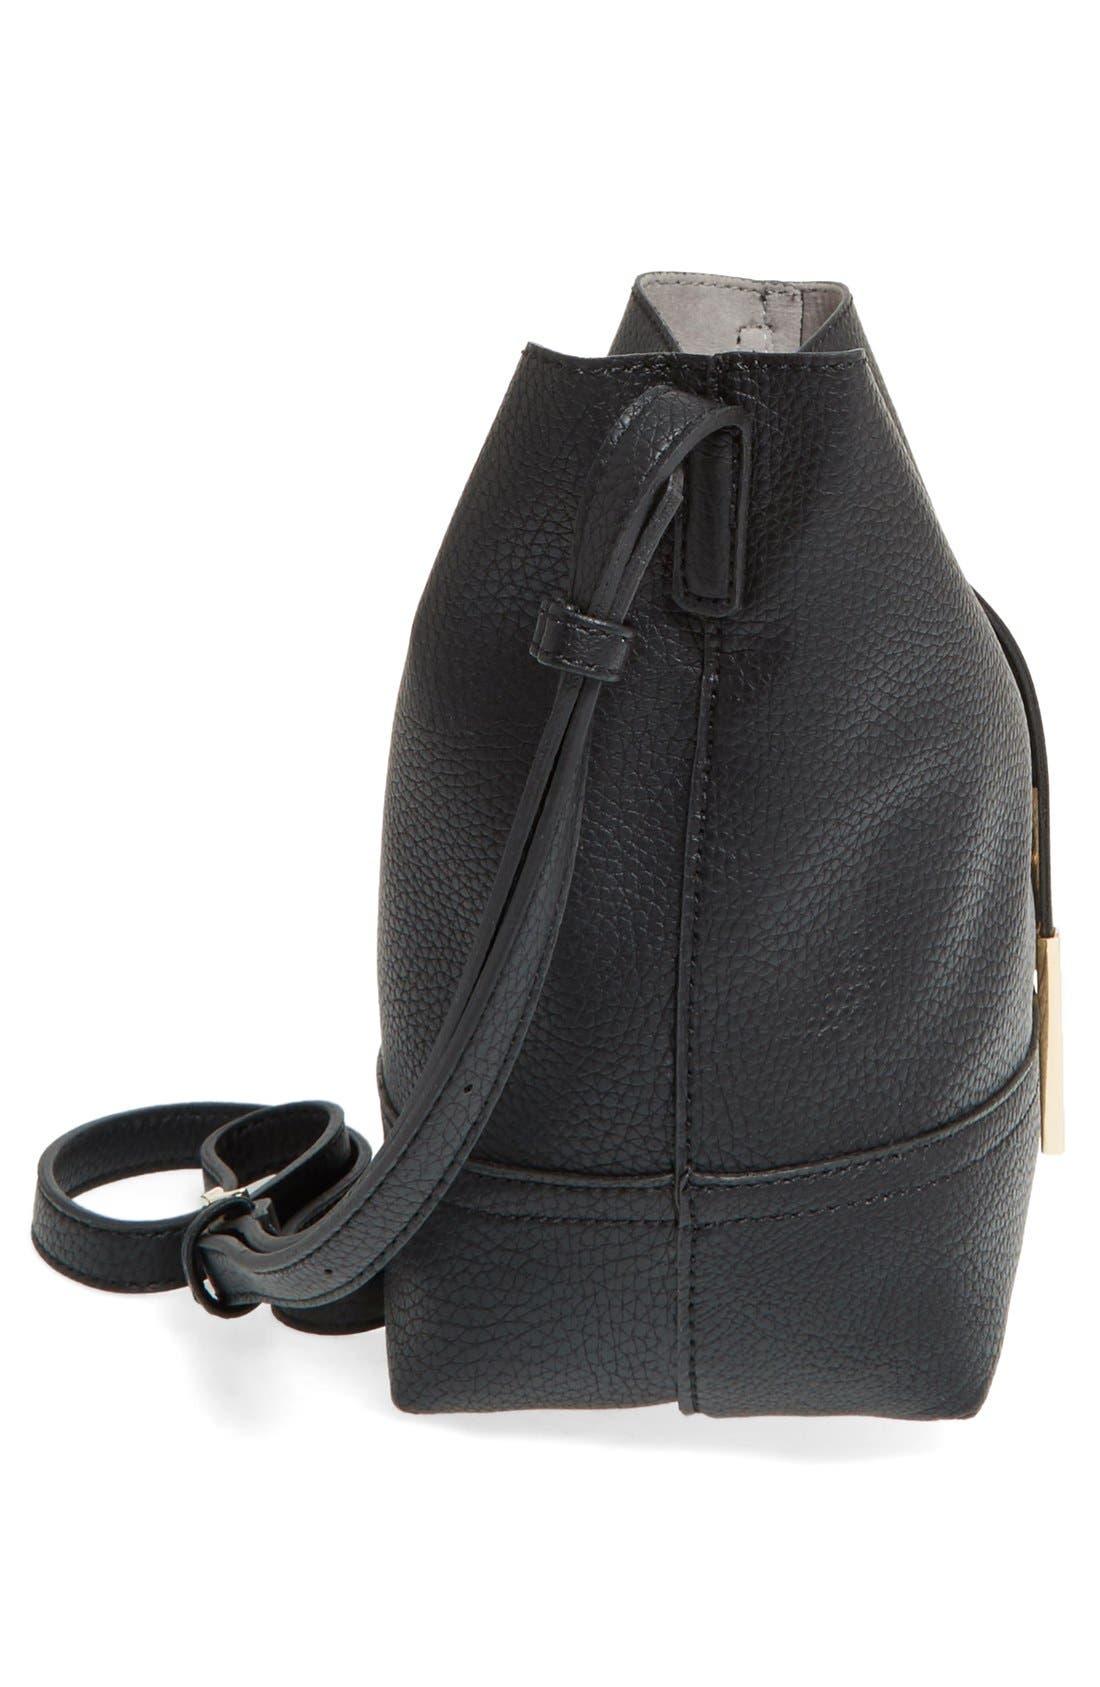 STREET LEVEL, Faux Leather Bucket Bag, Alternate thumbnail 6, color, 001